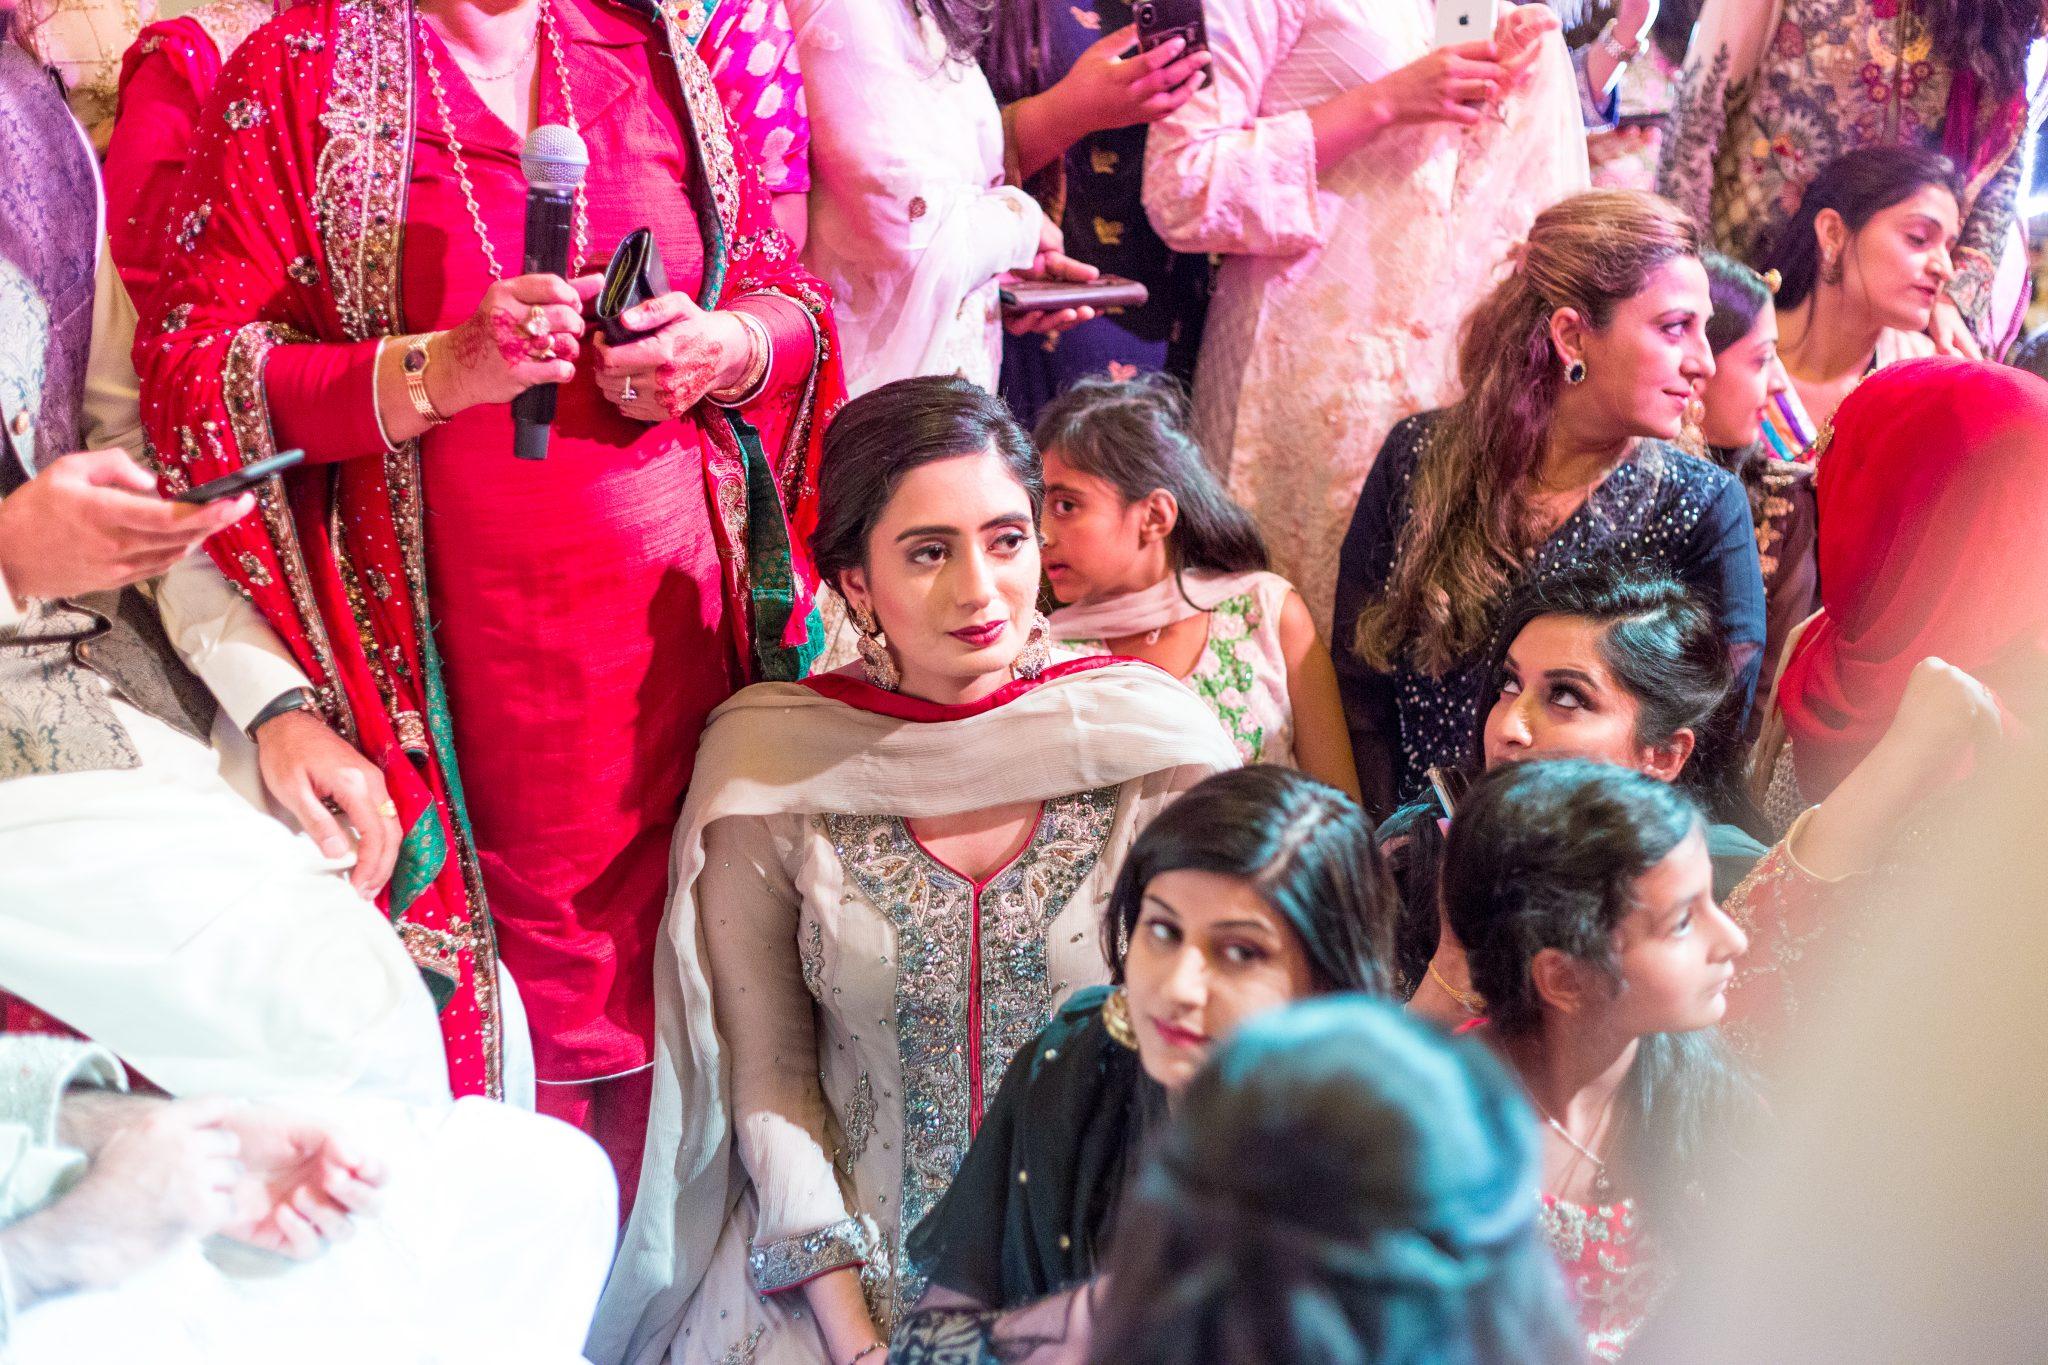 Rasm i Pakistanske bryllup står sentralt